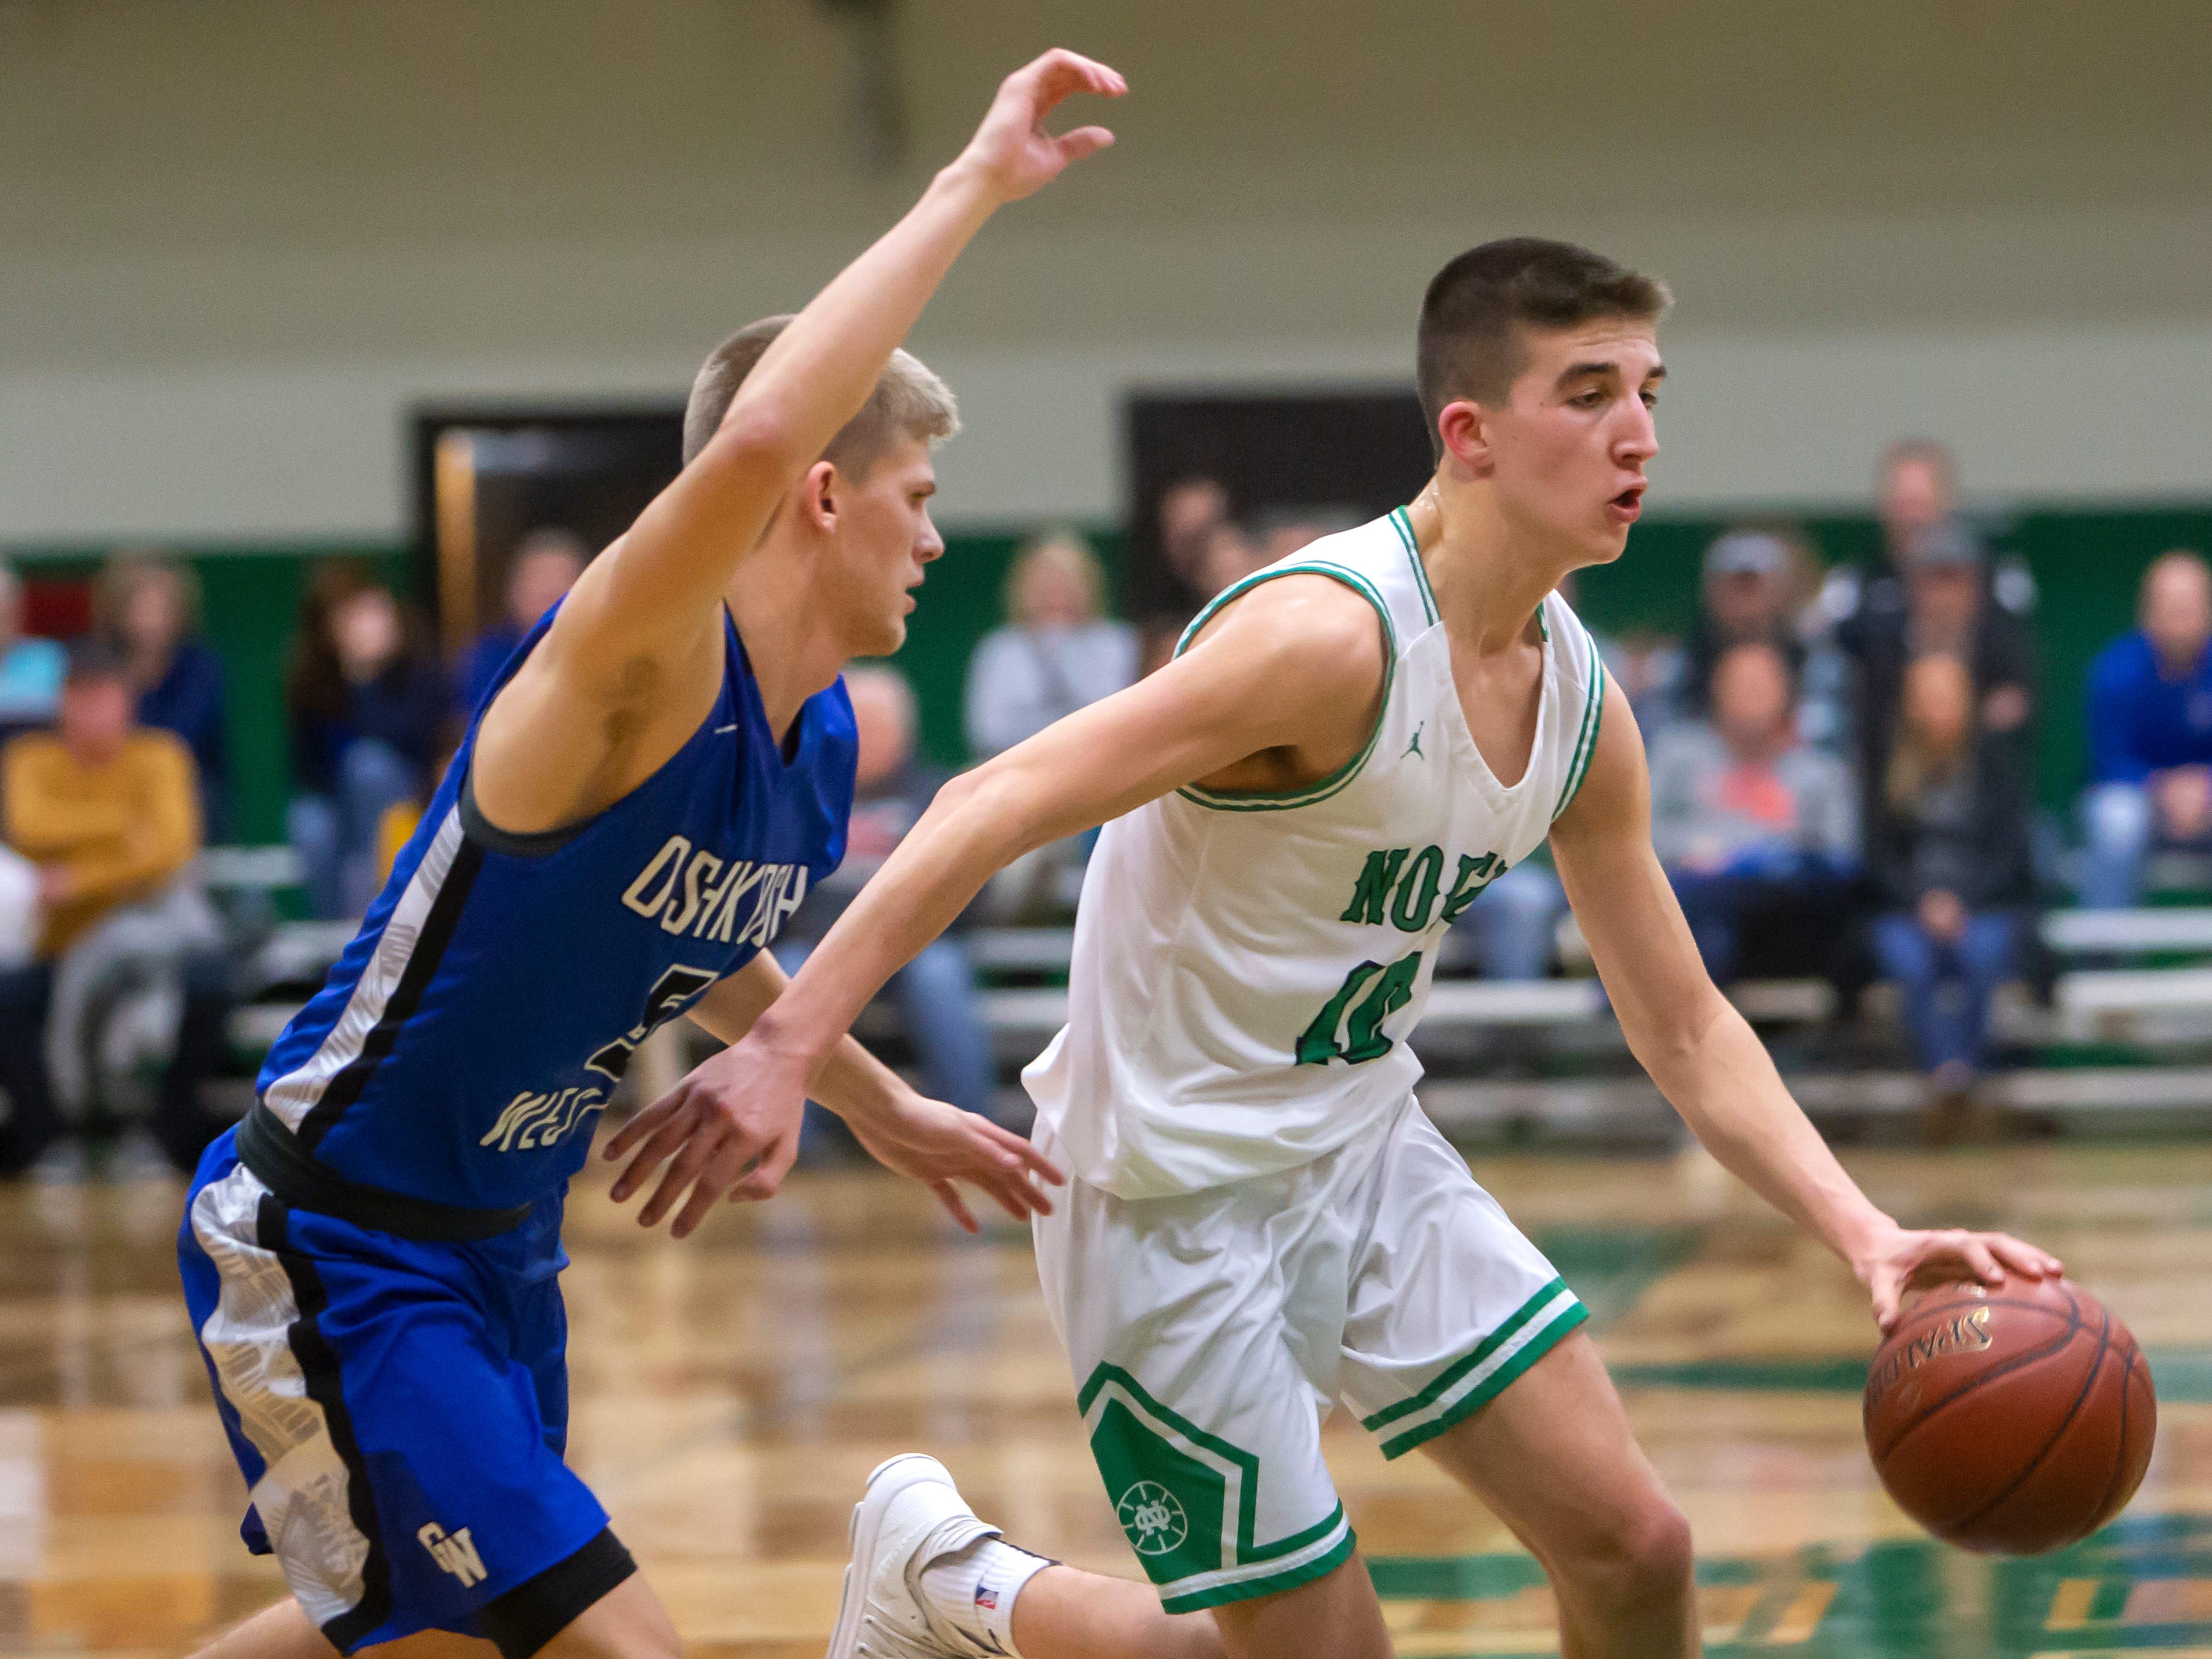 Oshkosh North's Josh Dilling drives the ball around Oshkosh West's AJ Ambroso at the Oshkosh North High School on Tuesday, Jan. 8, 2019.